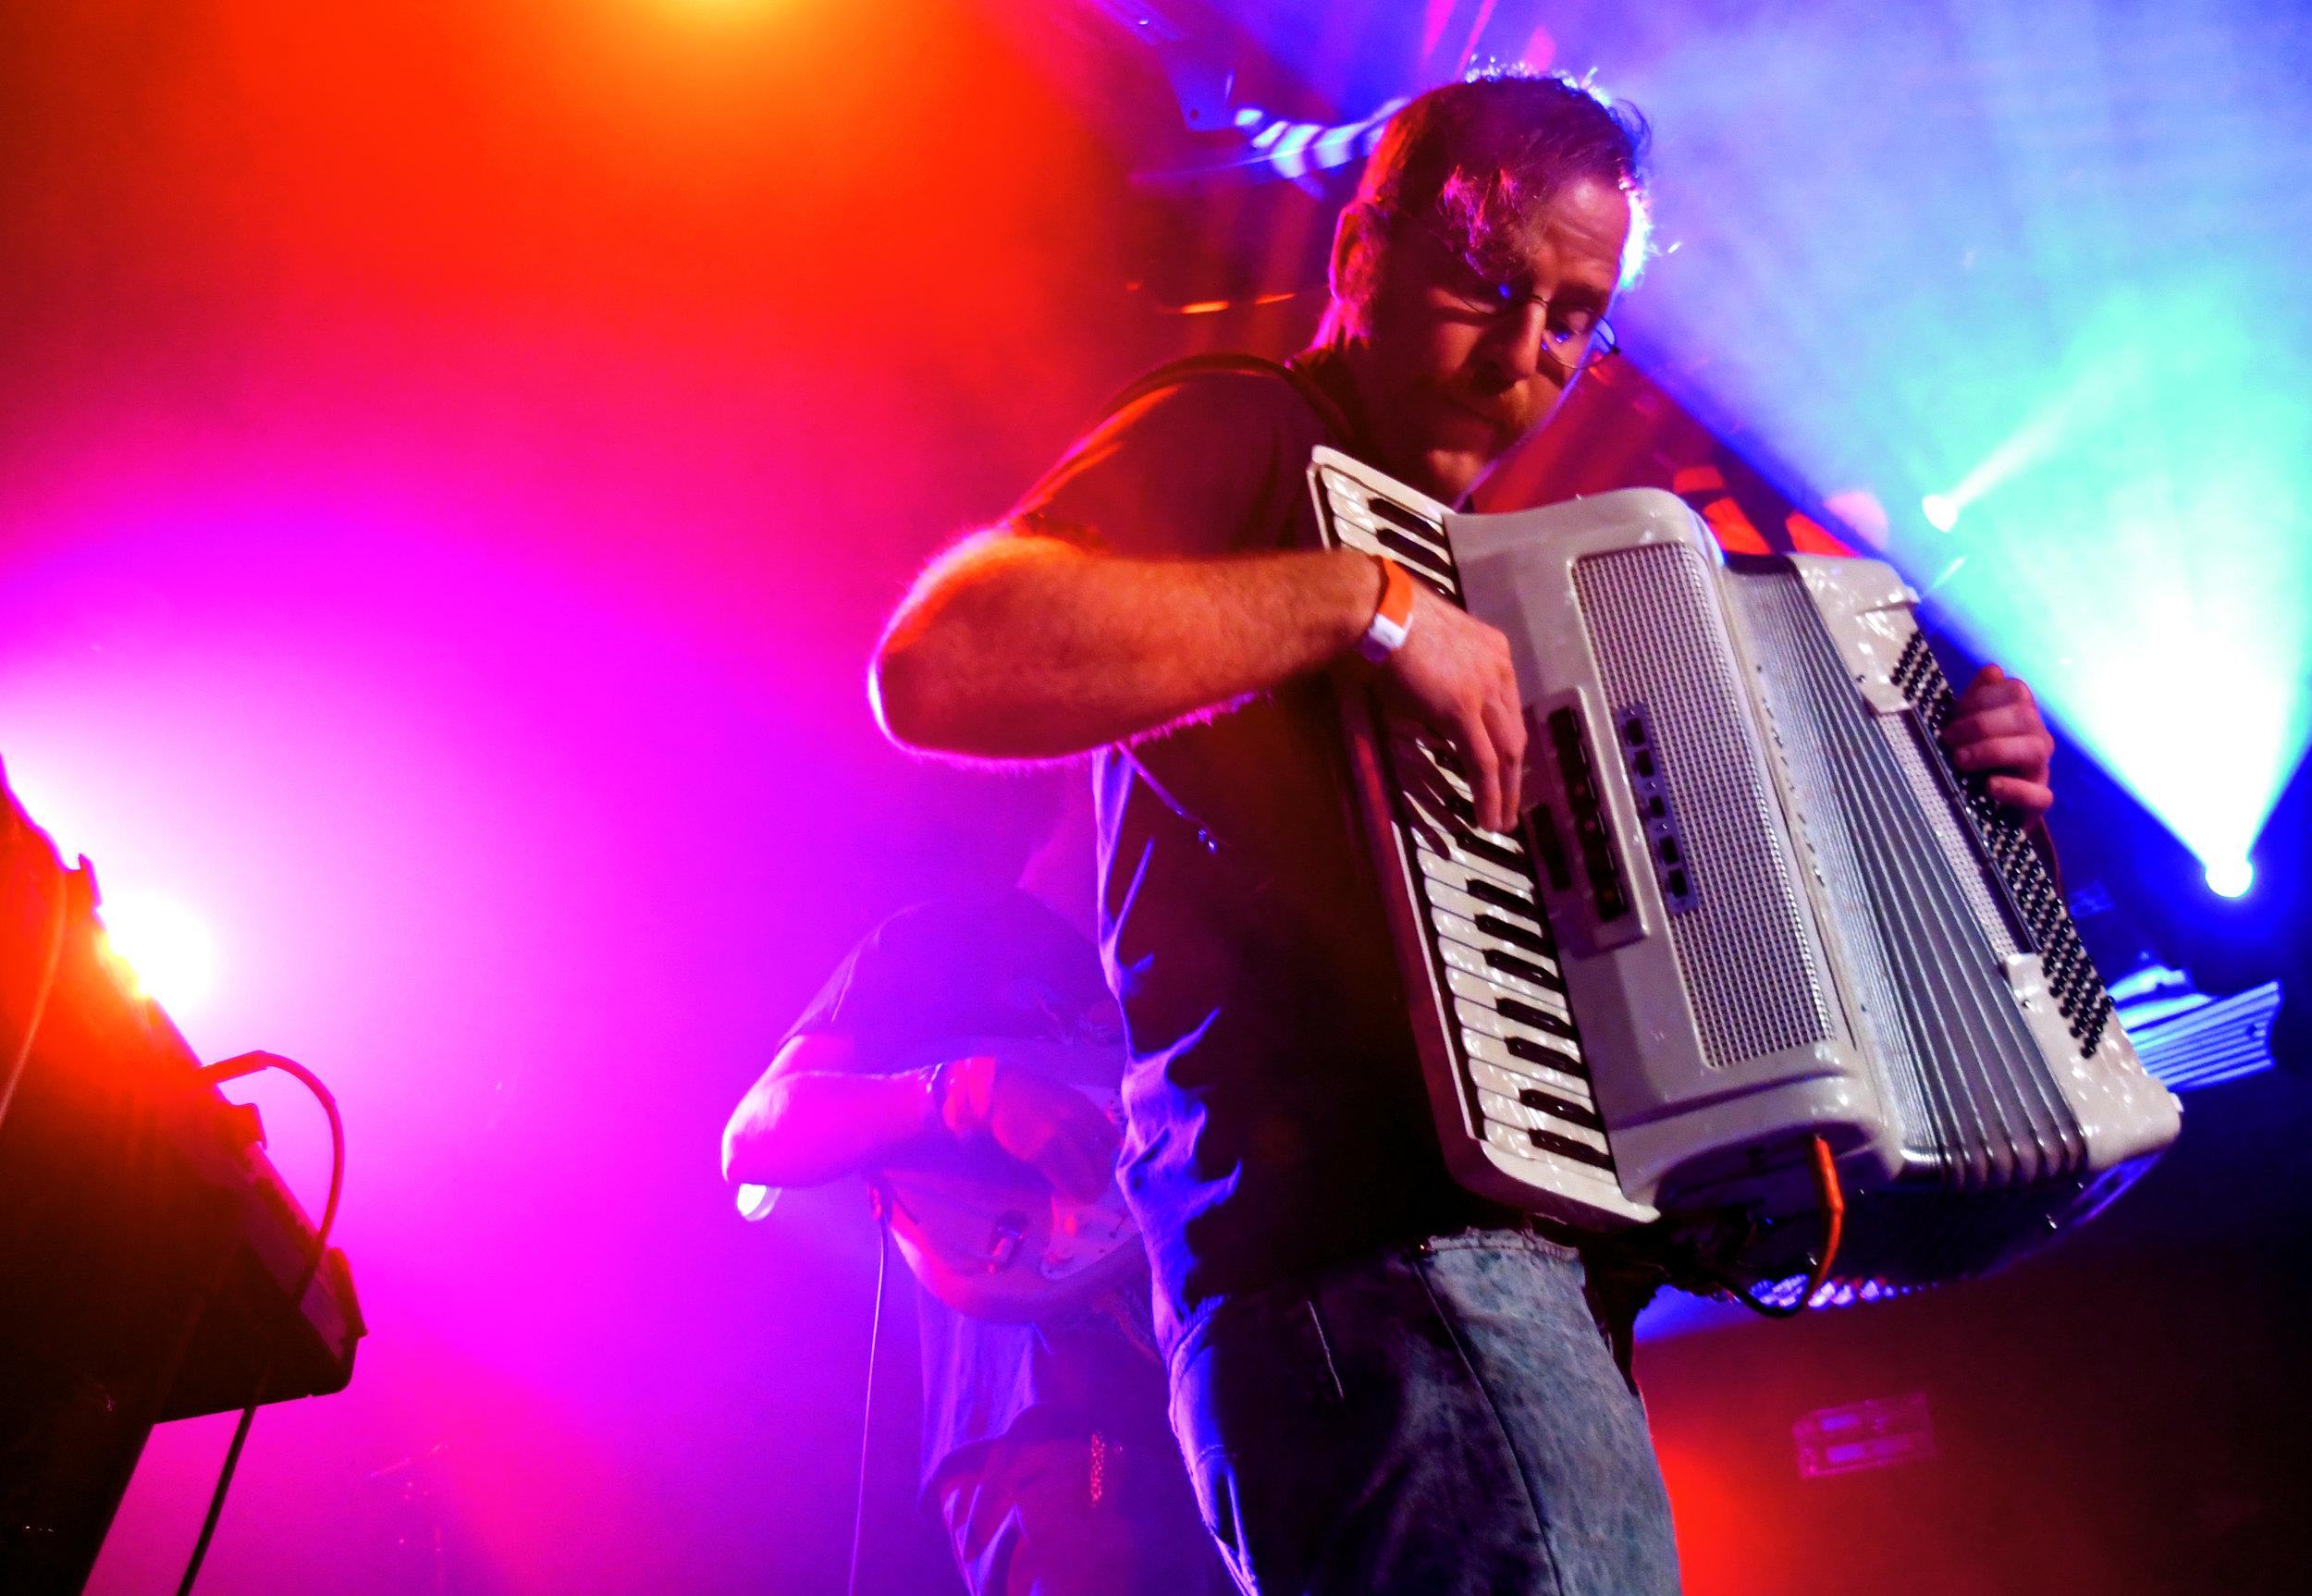 Jeffrey fucks it up on the accordion.